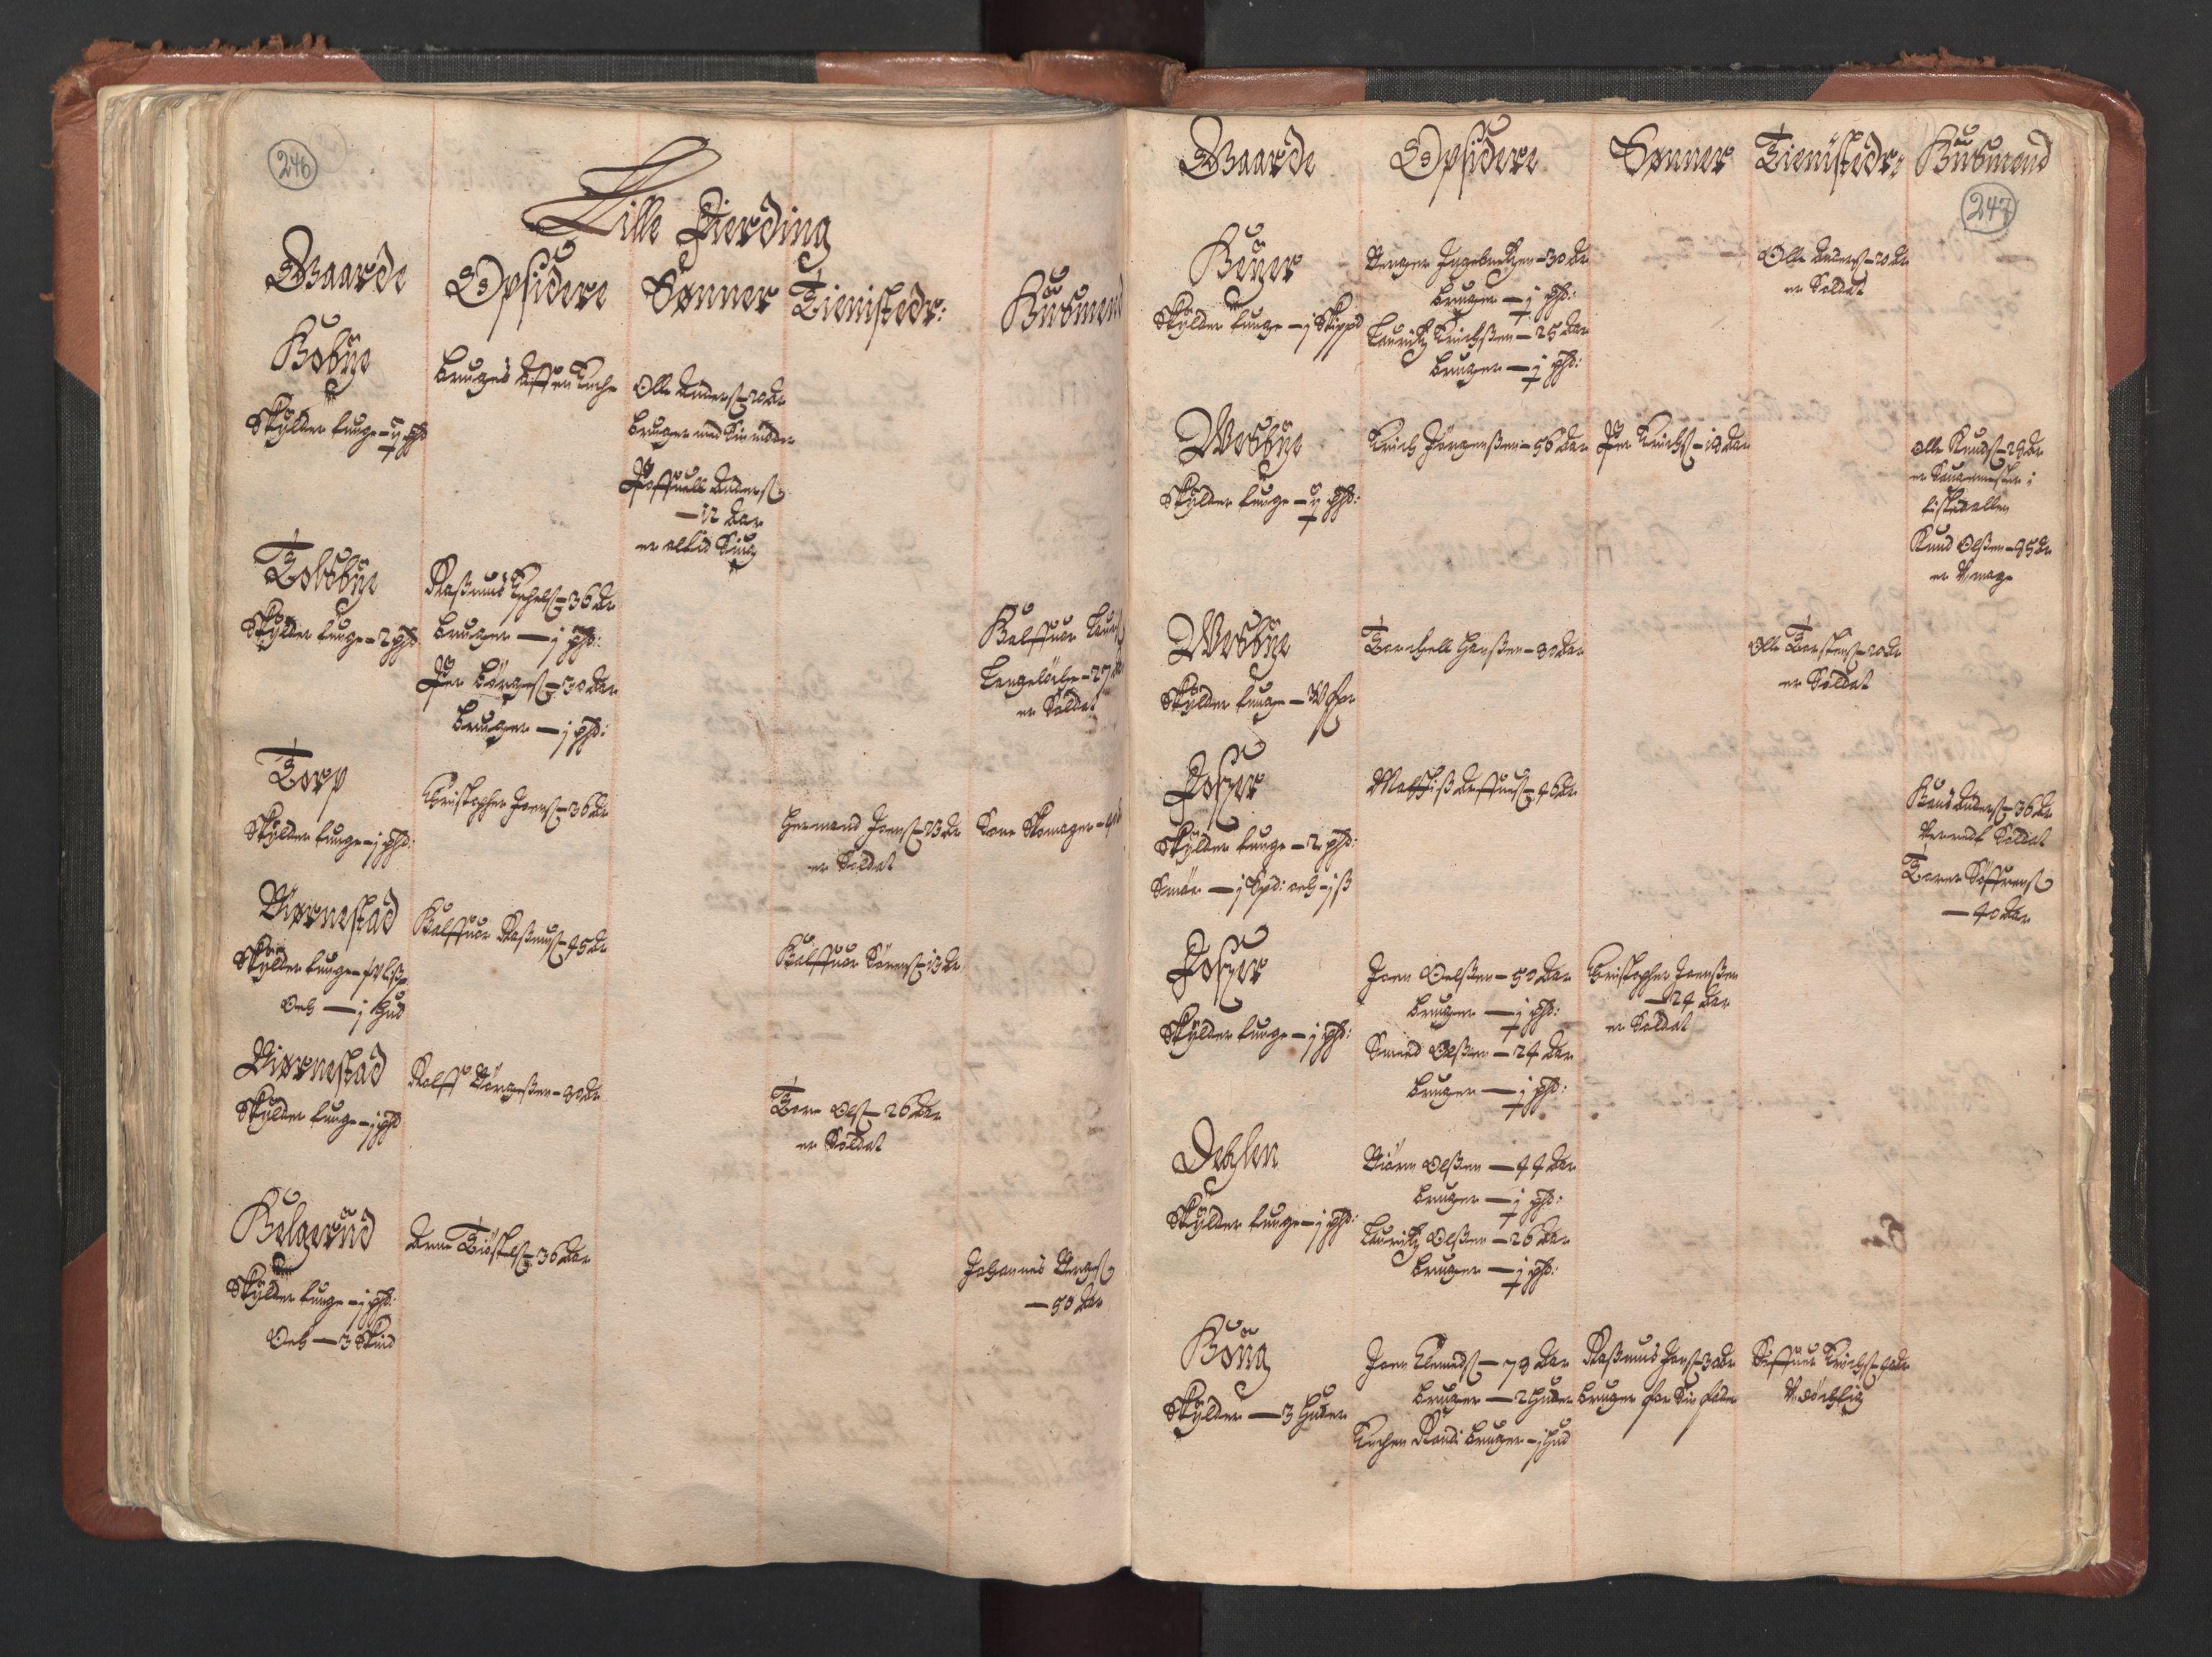 RA, Fogdenes og sorenskrivernes manntall 1664-1666, nr. 1: Fogderier (len og skipreider) i nåværende Østfold fylke, 1664, s. 246-247